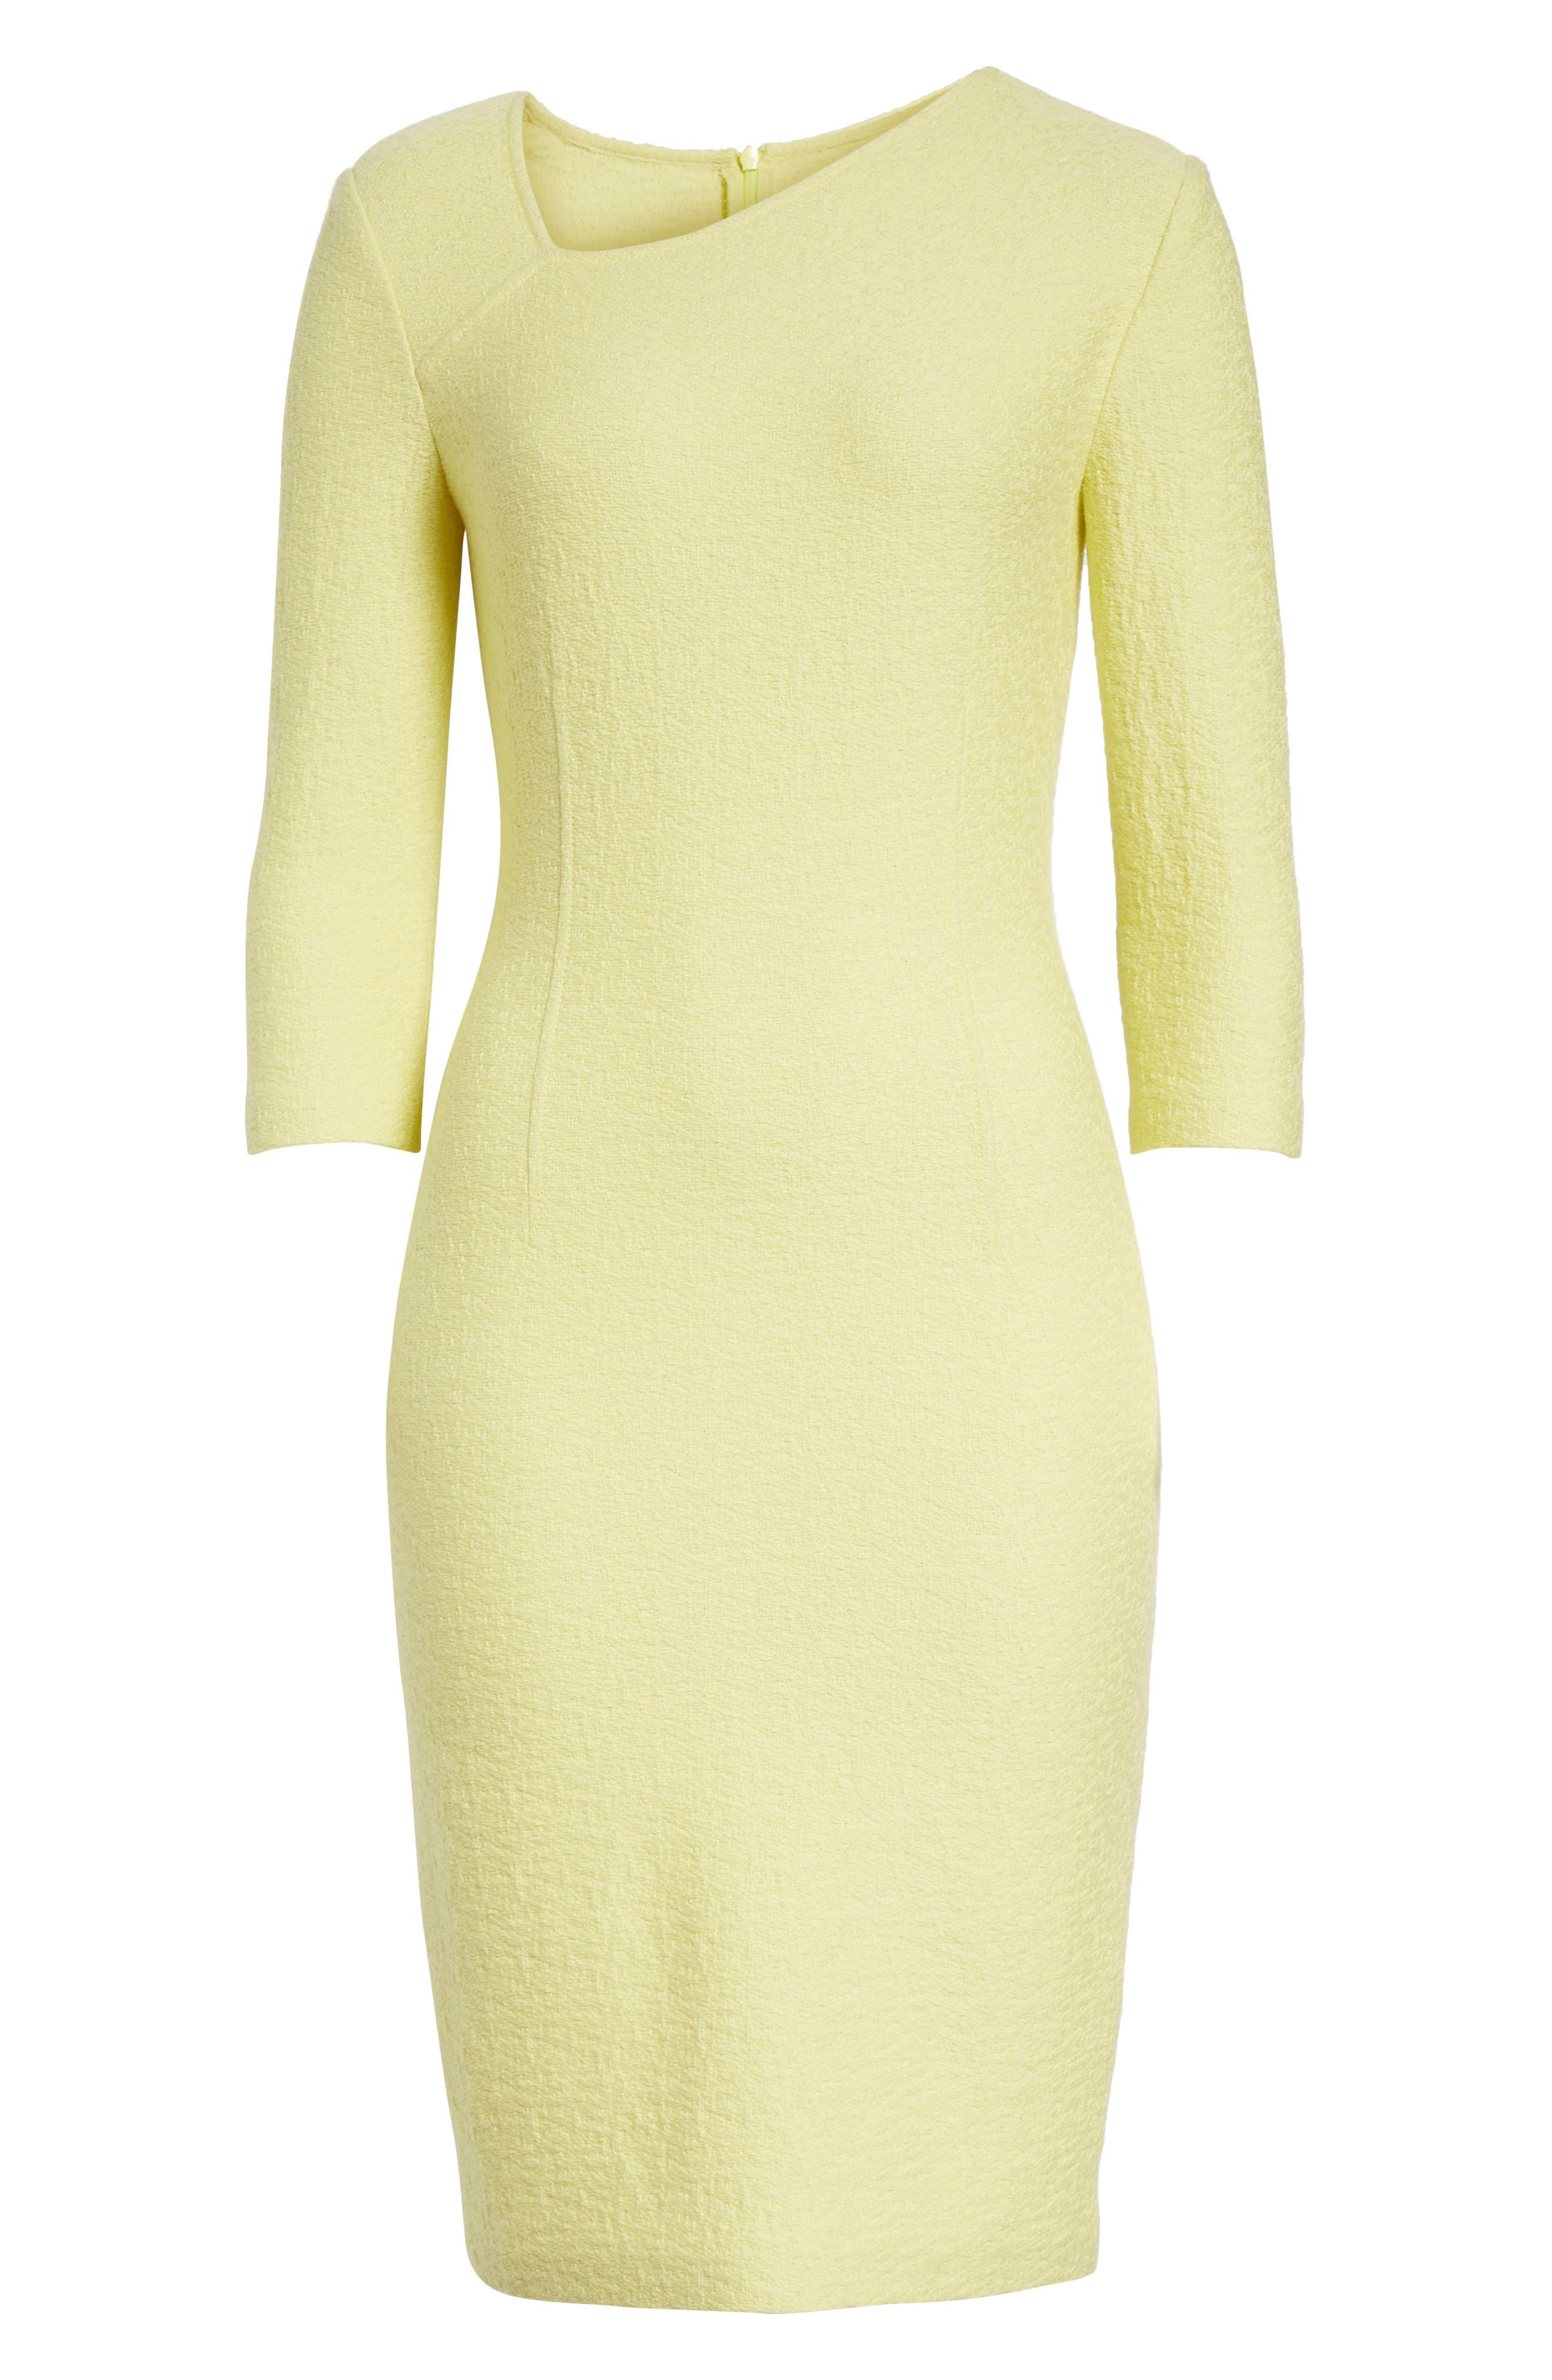 Hannah Knit Asymmetrical Sheath Dress,                             Alternate thumbnail 7, color,                             Citron